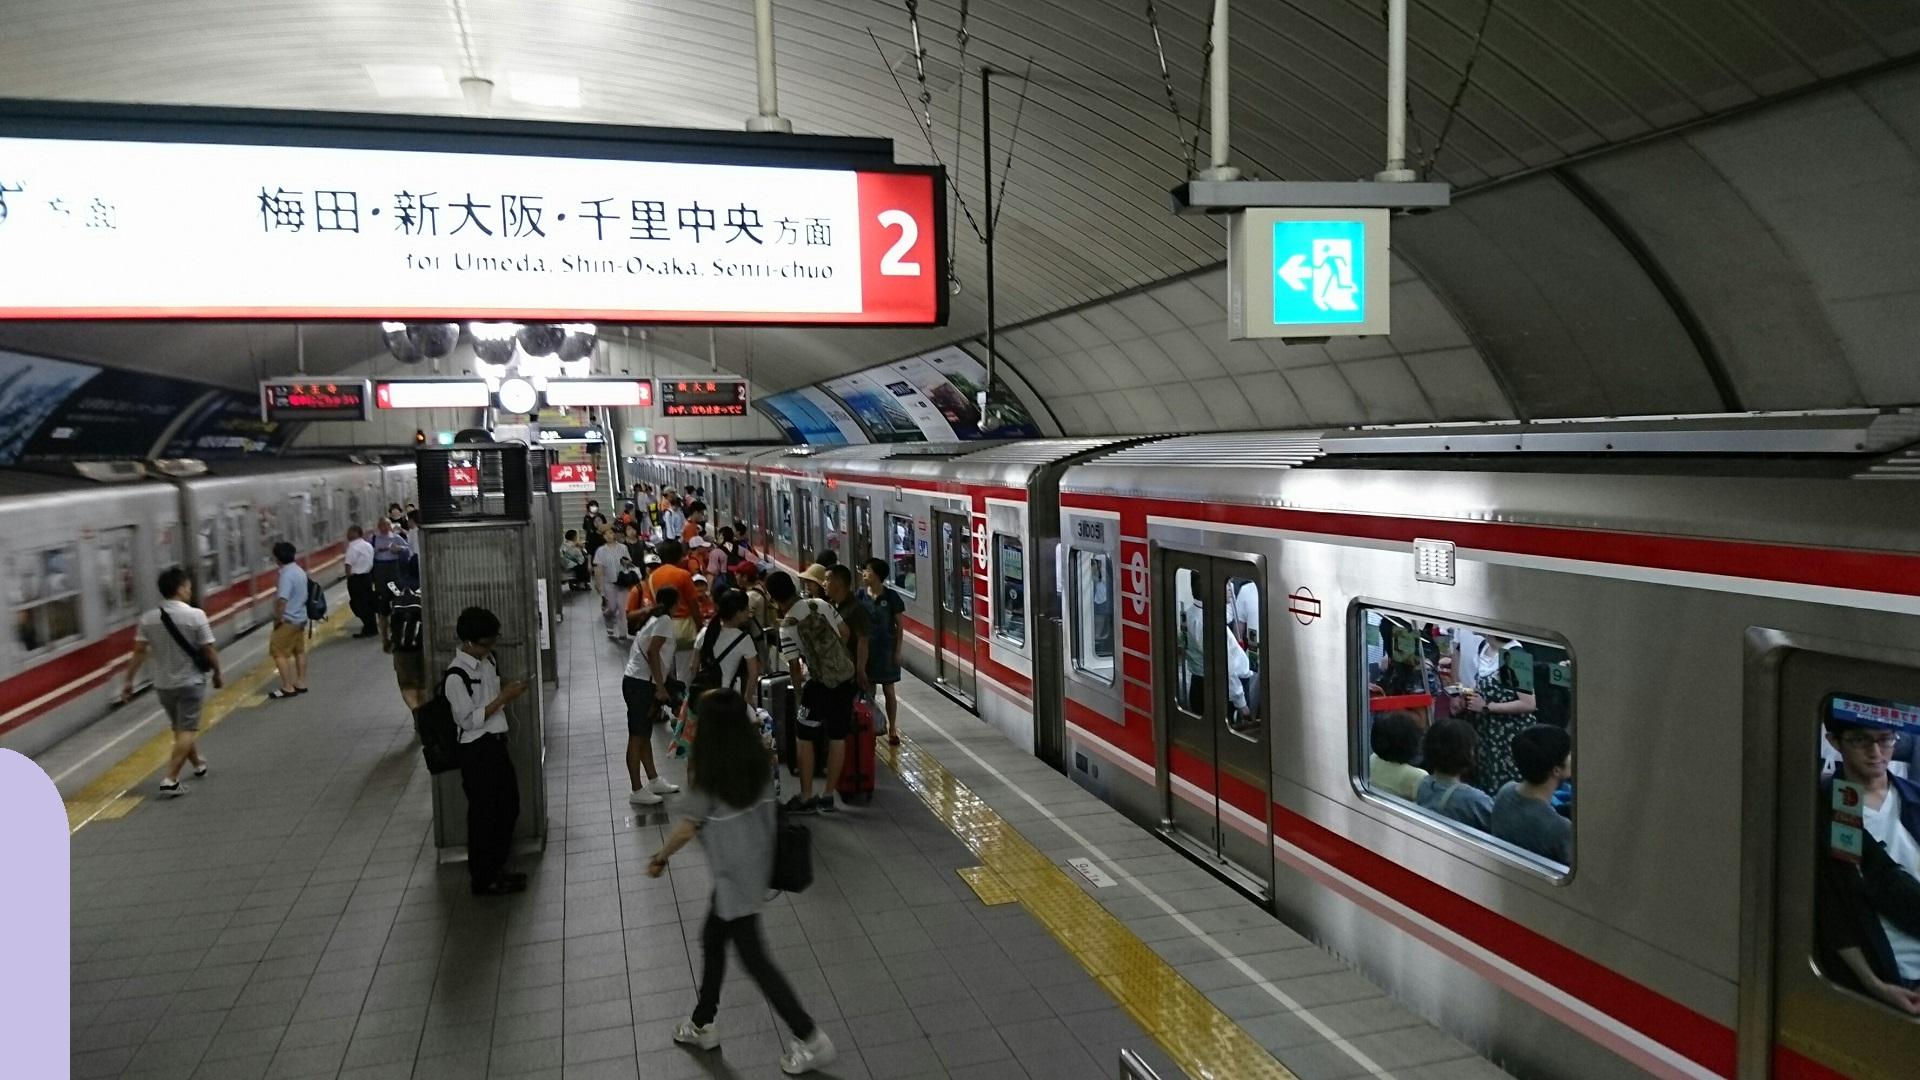 2017.8.18 地下鉄御堂筋線 (2) 淀屋橋 - 新大阪いき 1920-1080